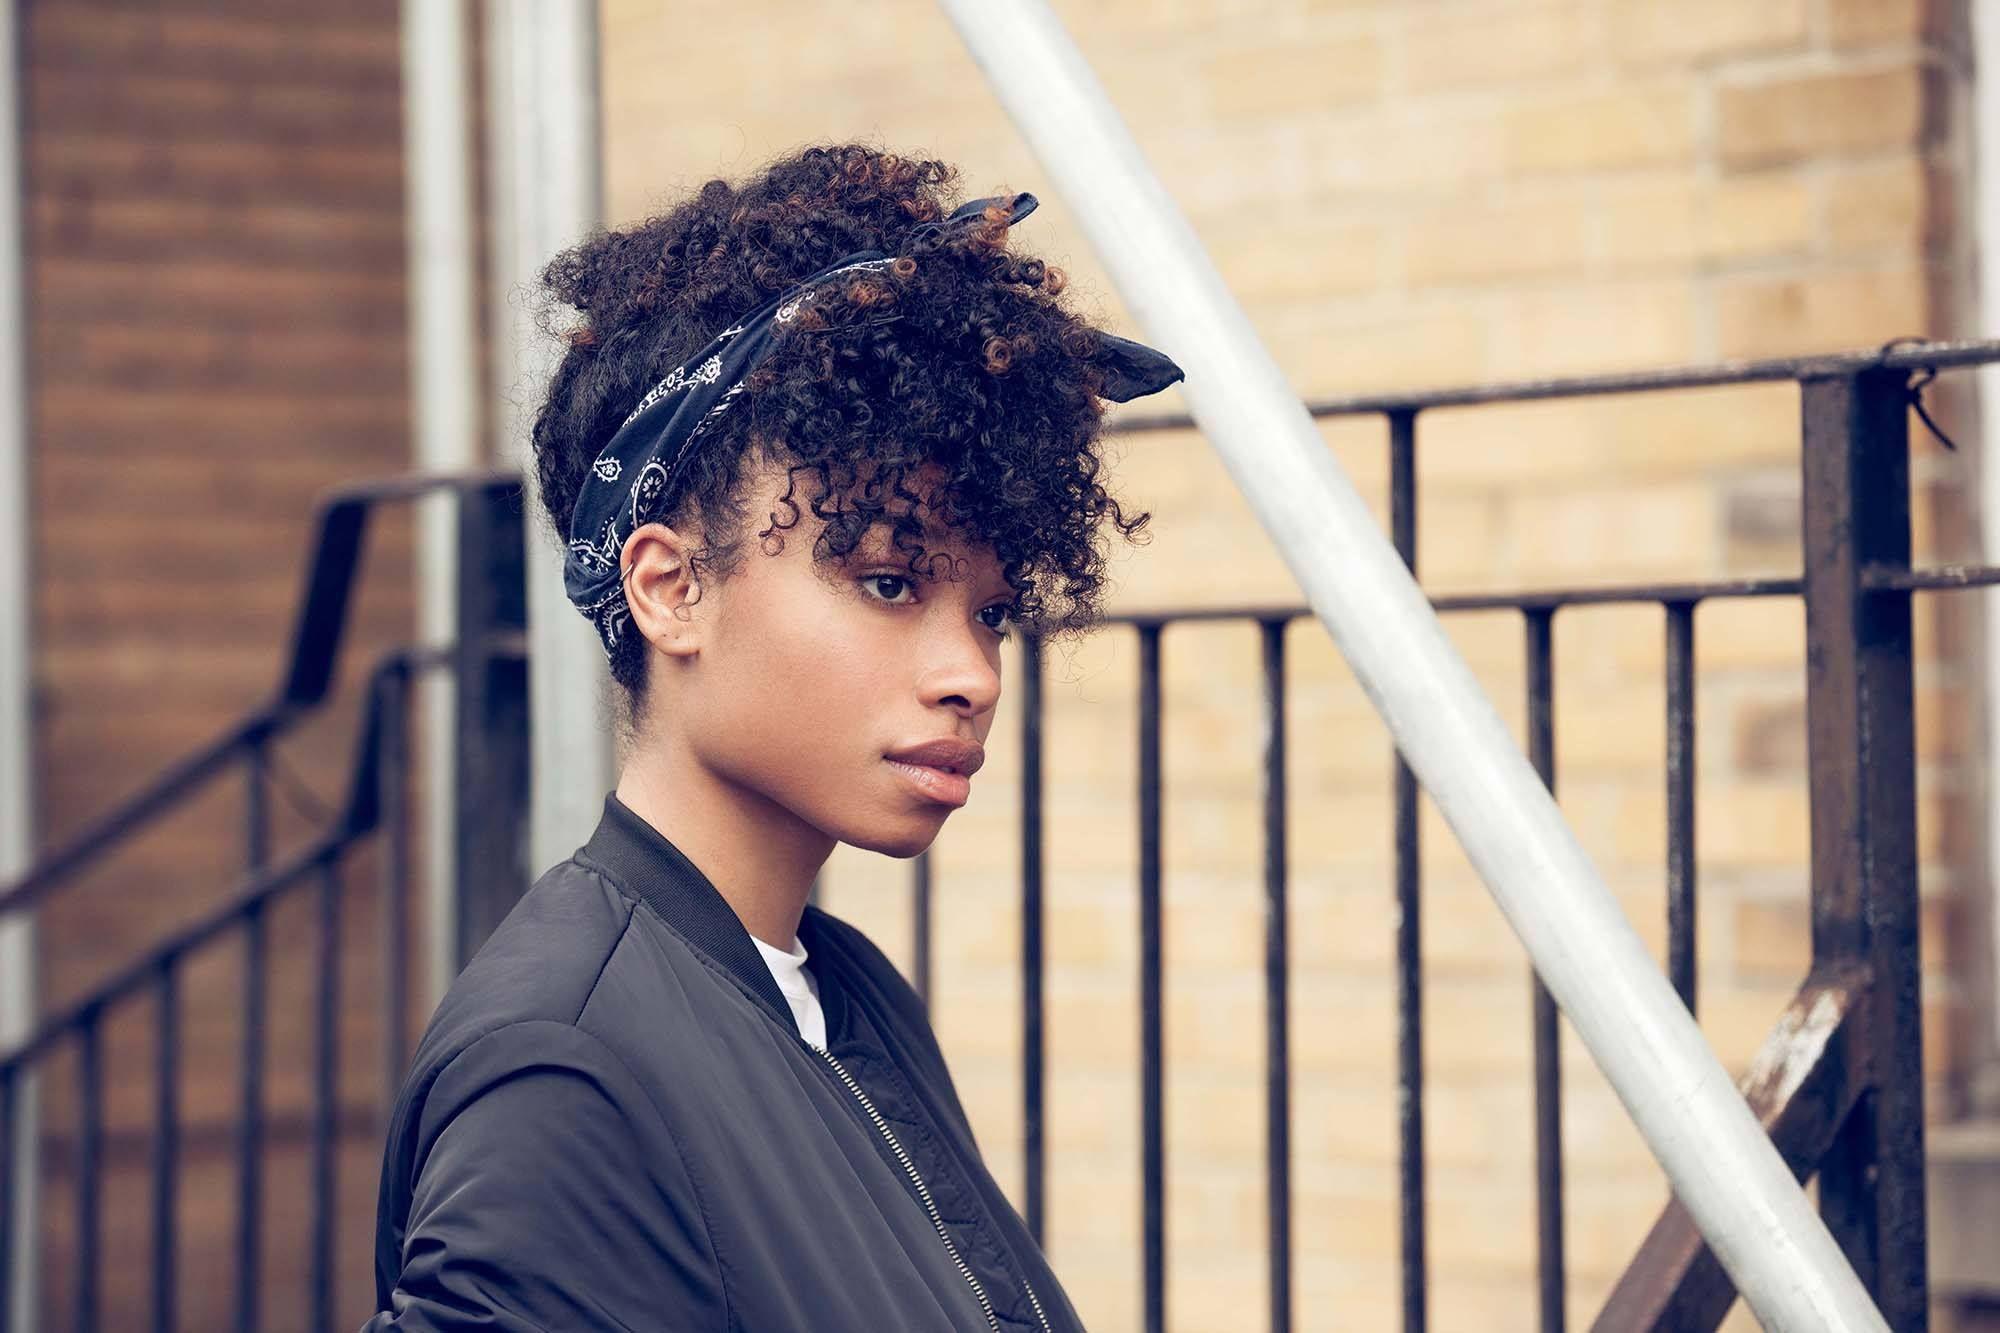 Turban Headband Curly Hair Short Curly Hair Layeredcurlyhair Turban Headband Hairstyles Scarf Hairstyles Headband Hairstyles